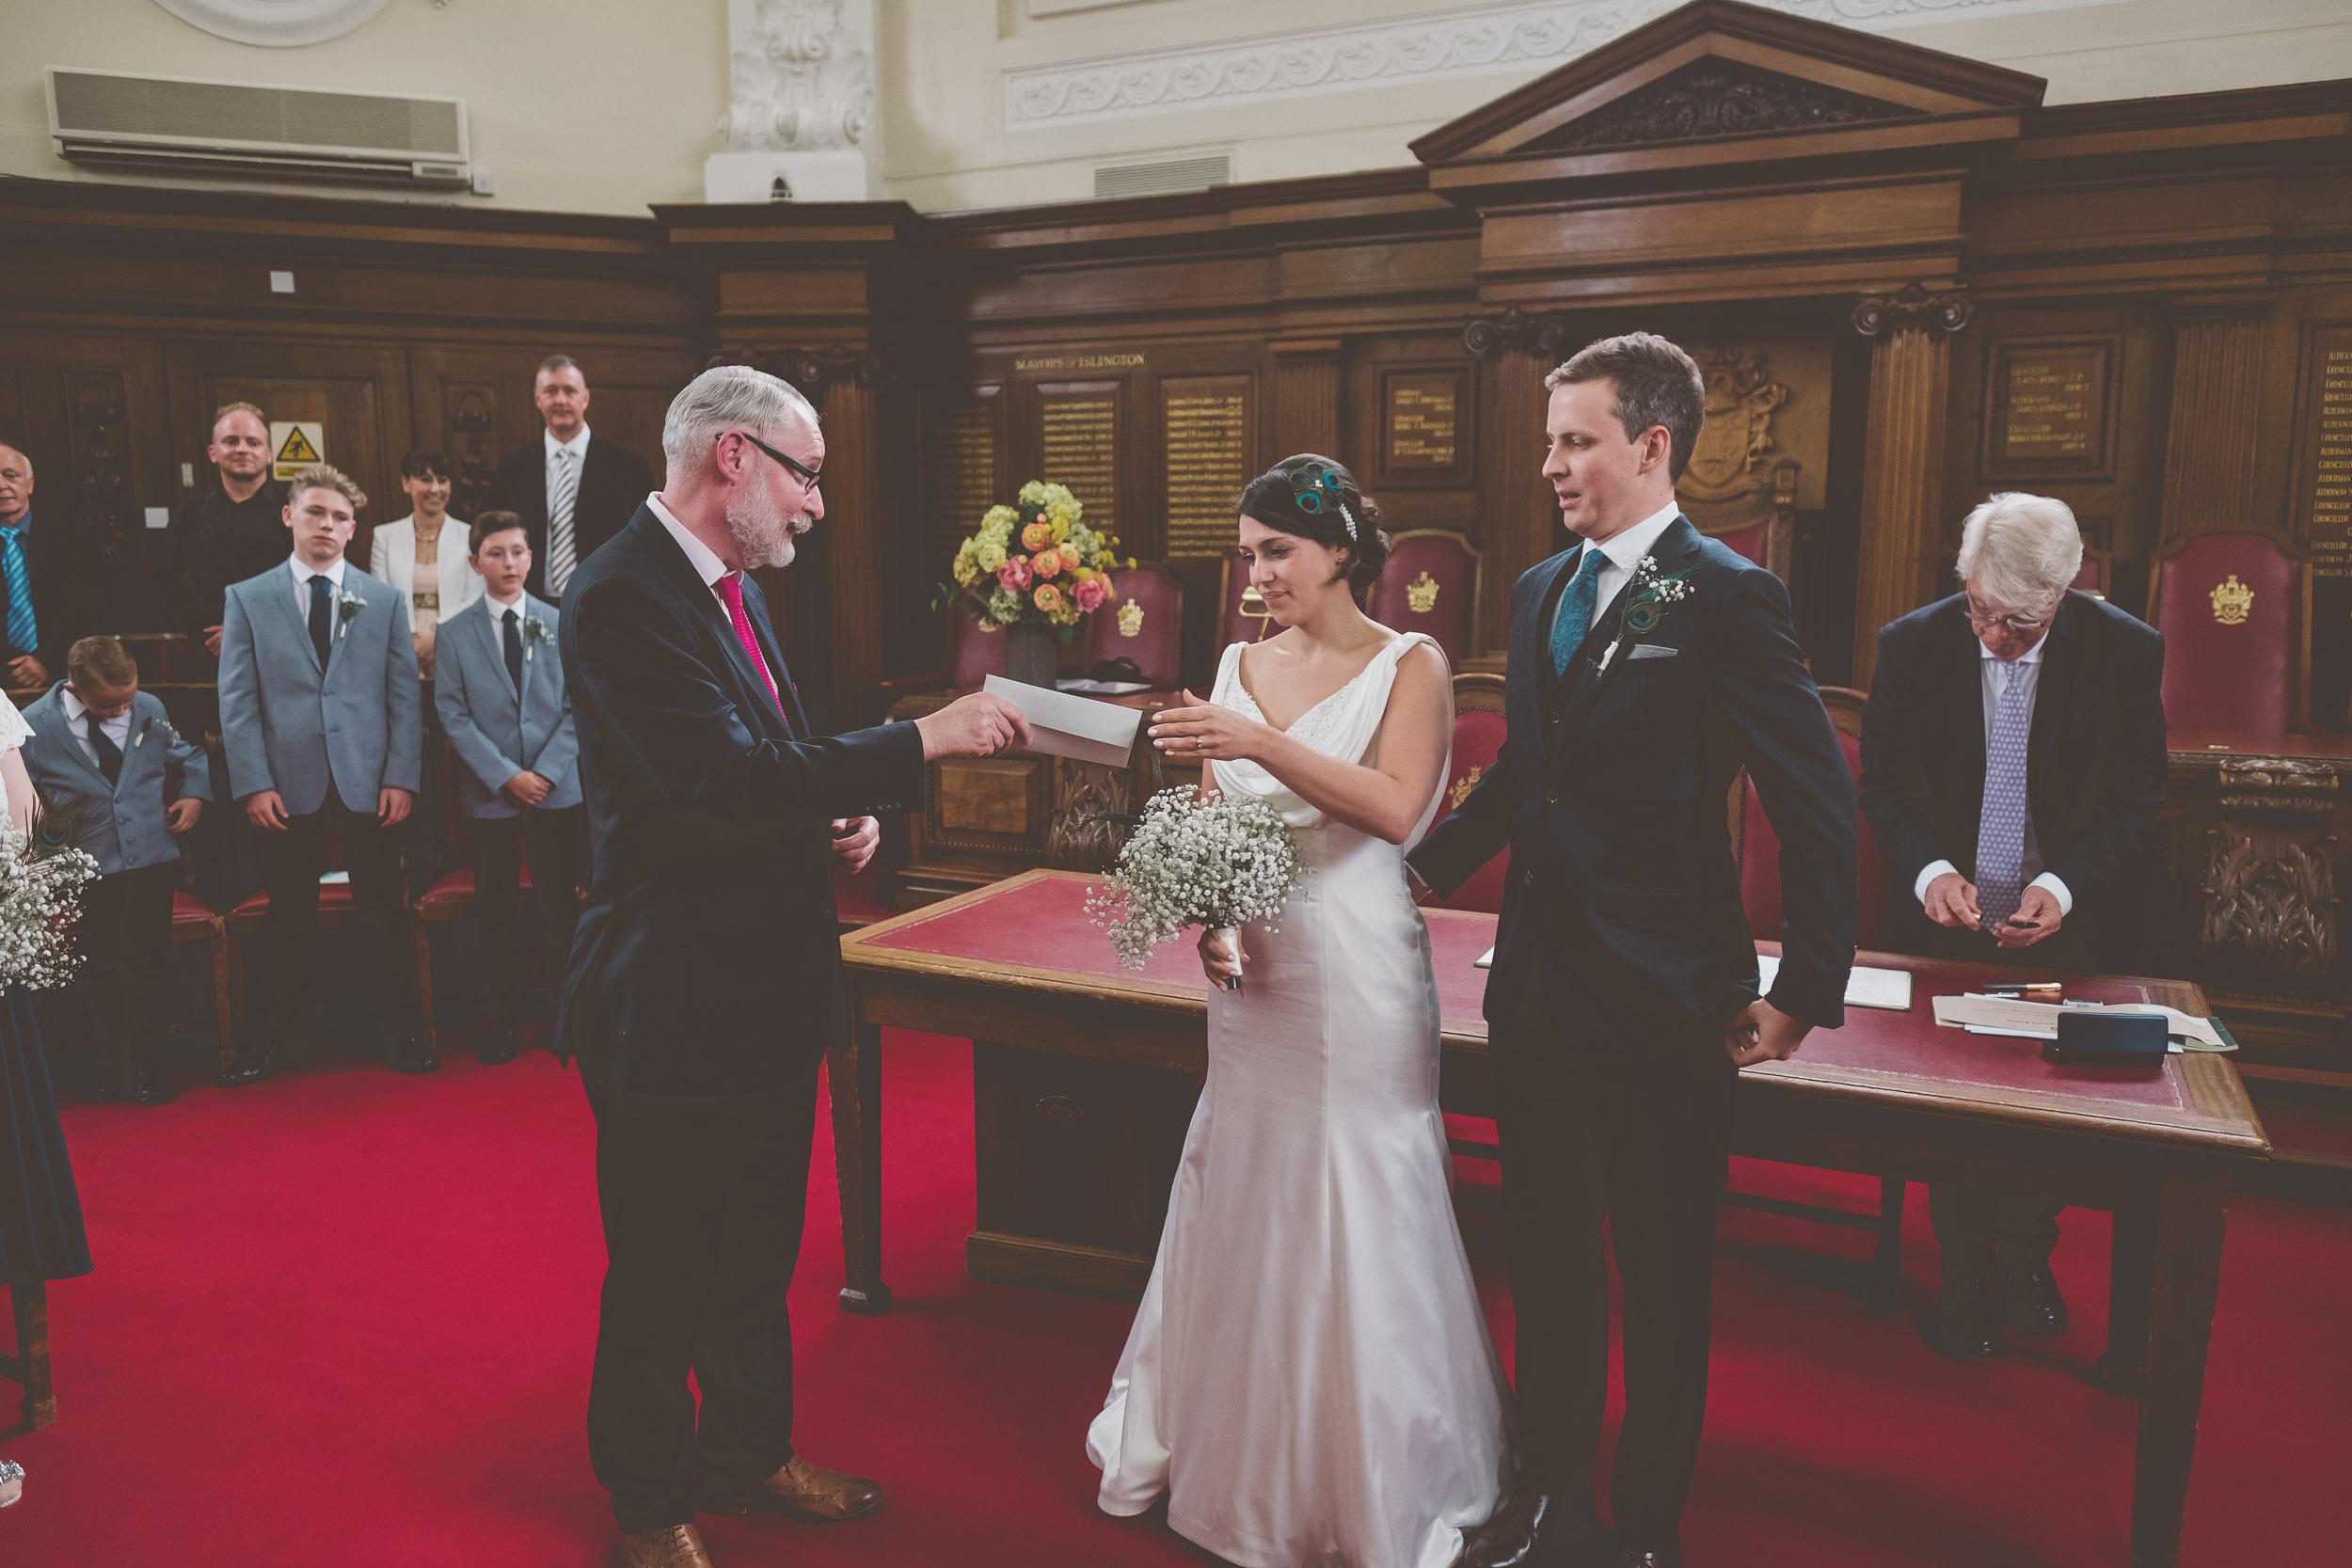 islington-town-hall-4th-floor-studios-wedding119.jpg